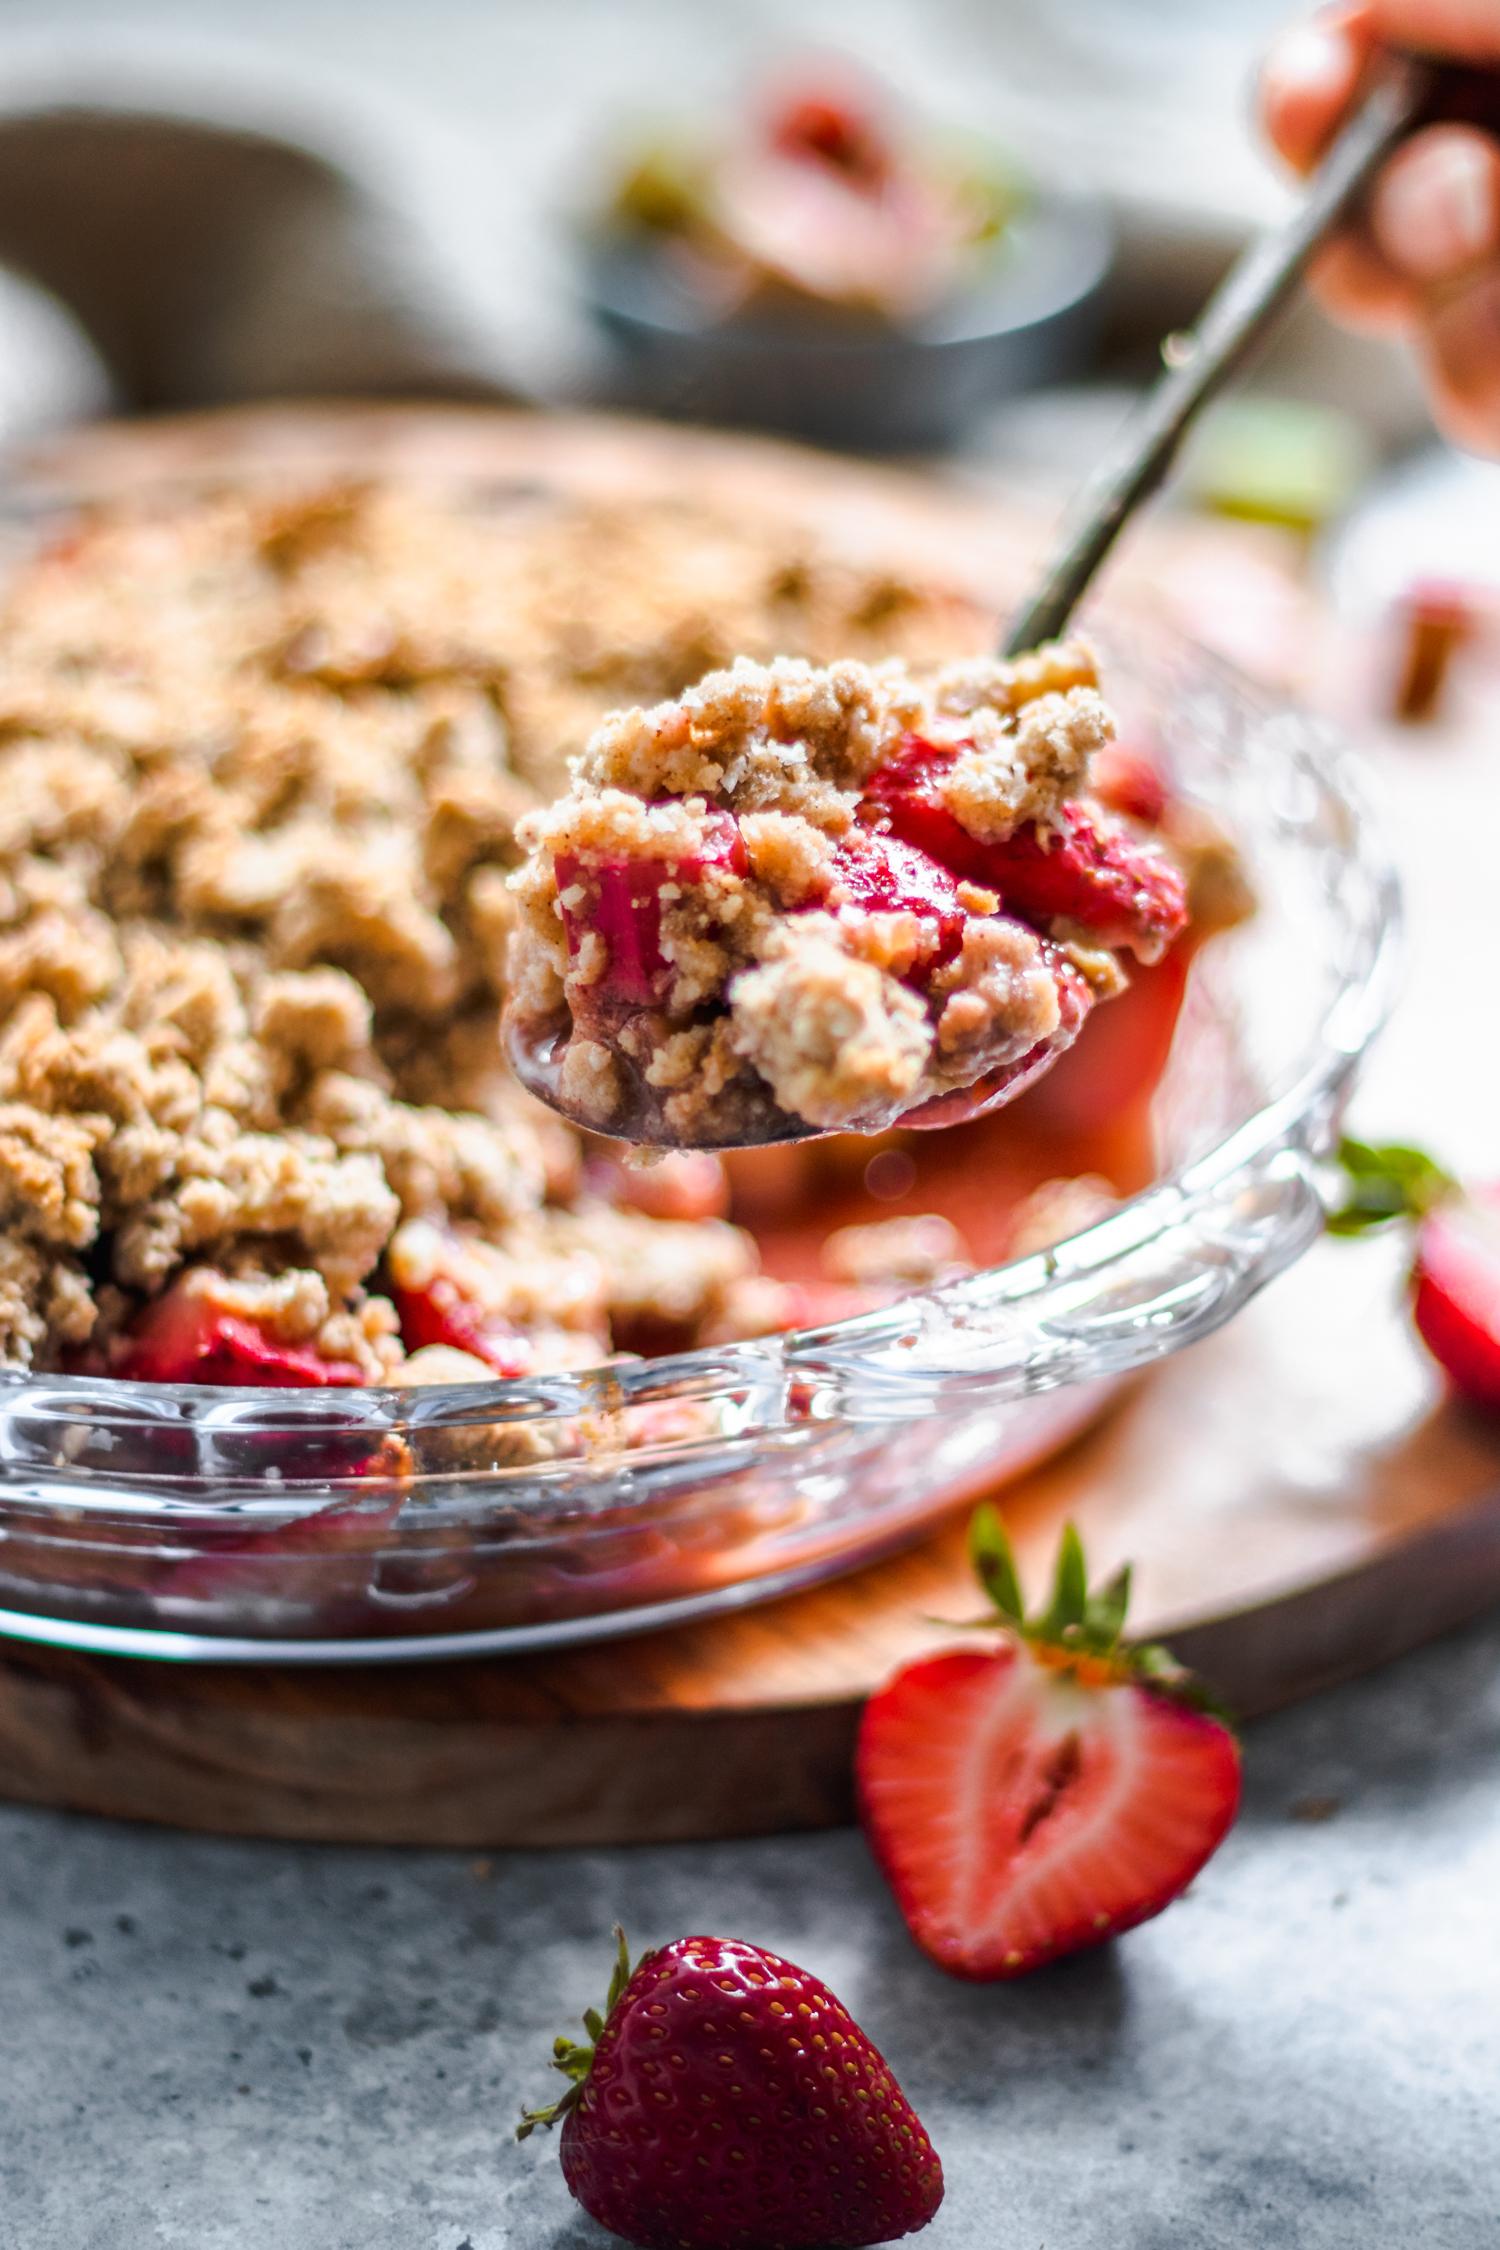 Strawberry Rhubarb Crisp (Grain Free & Oil Free)